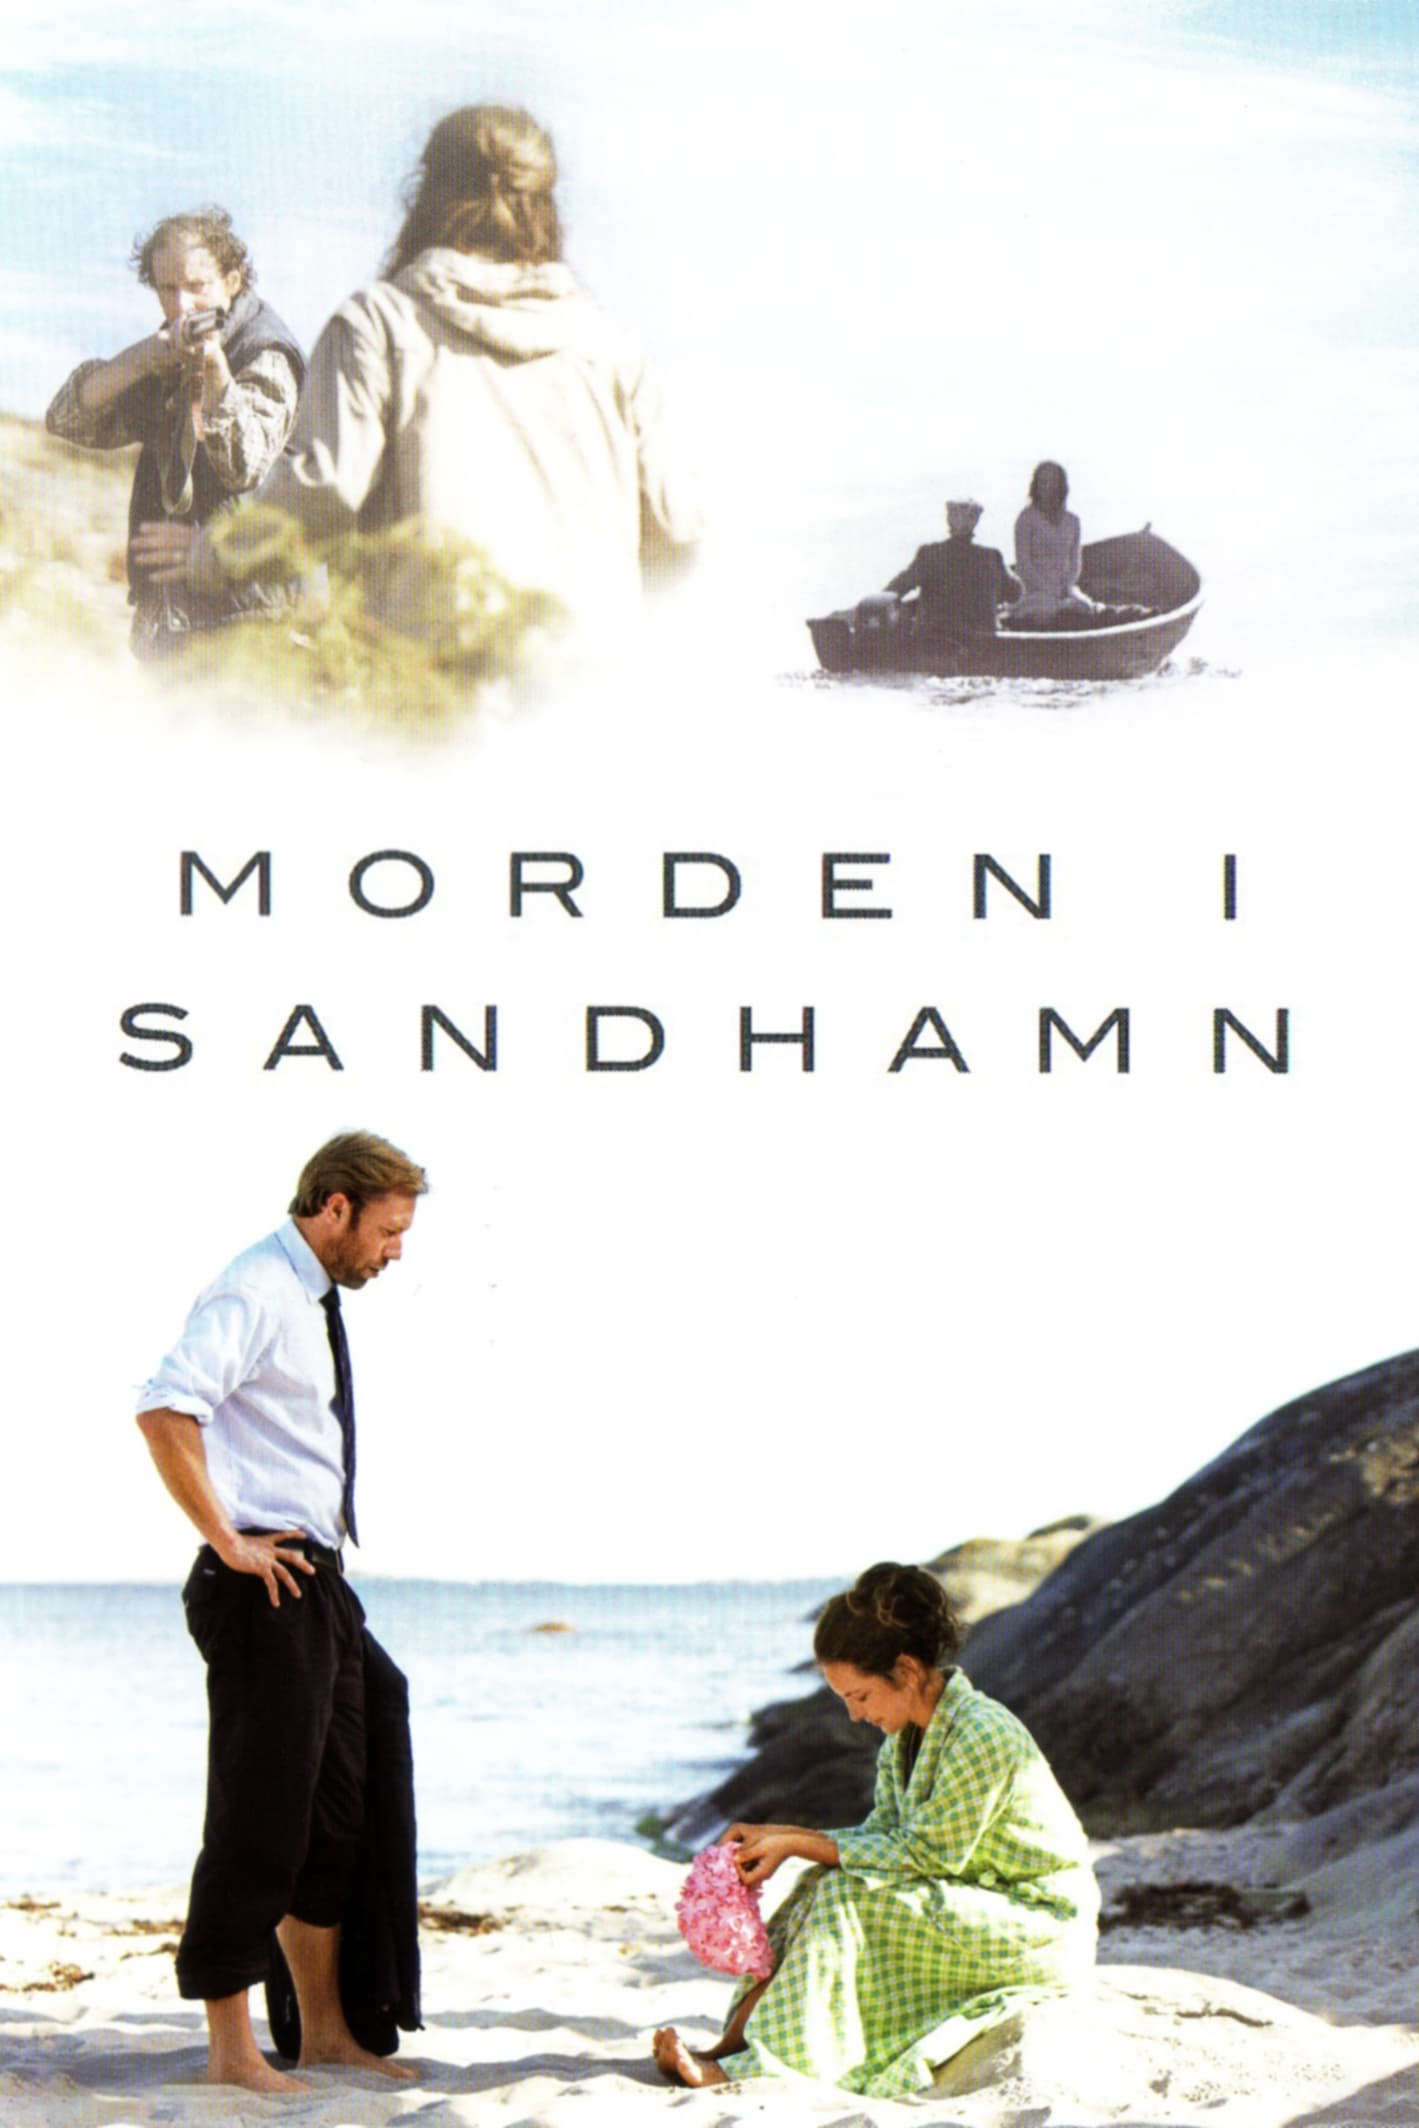 The Sandhamn Murders (2010)